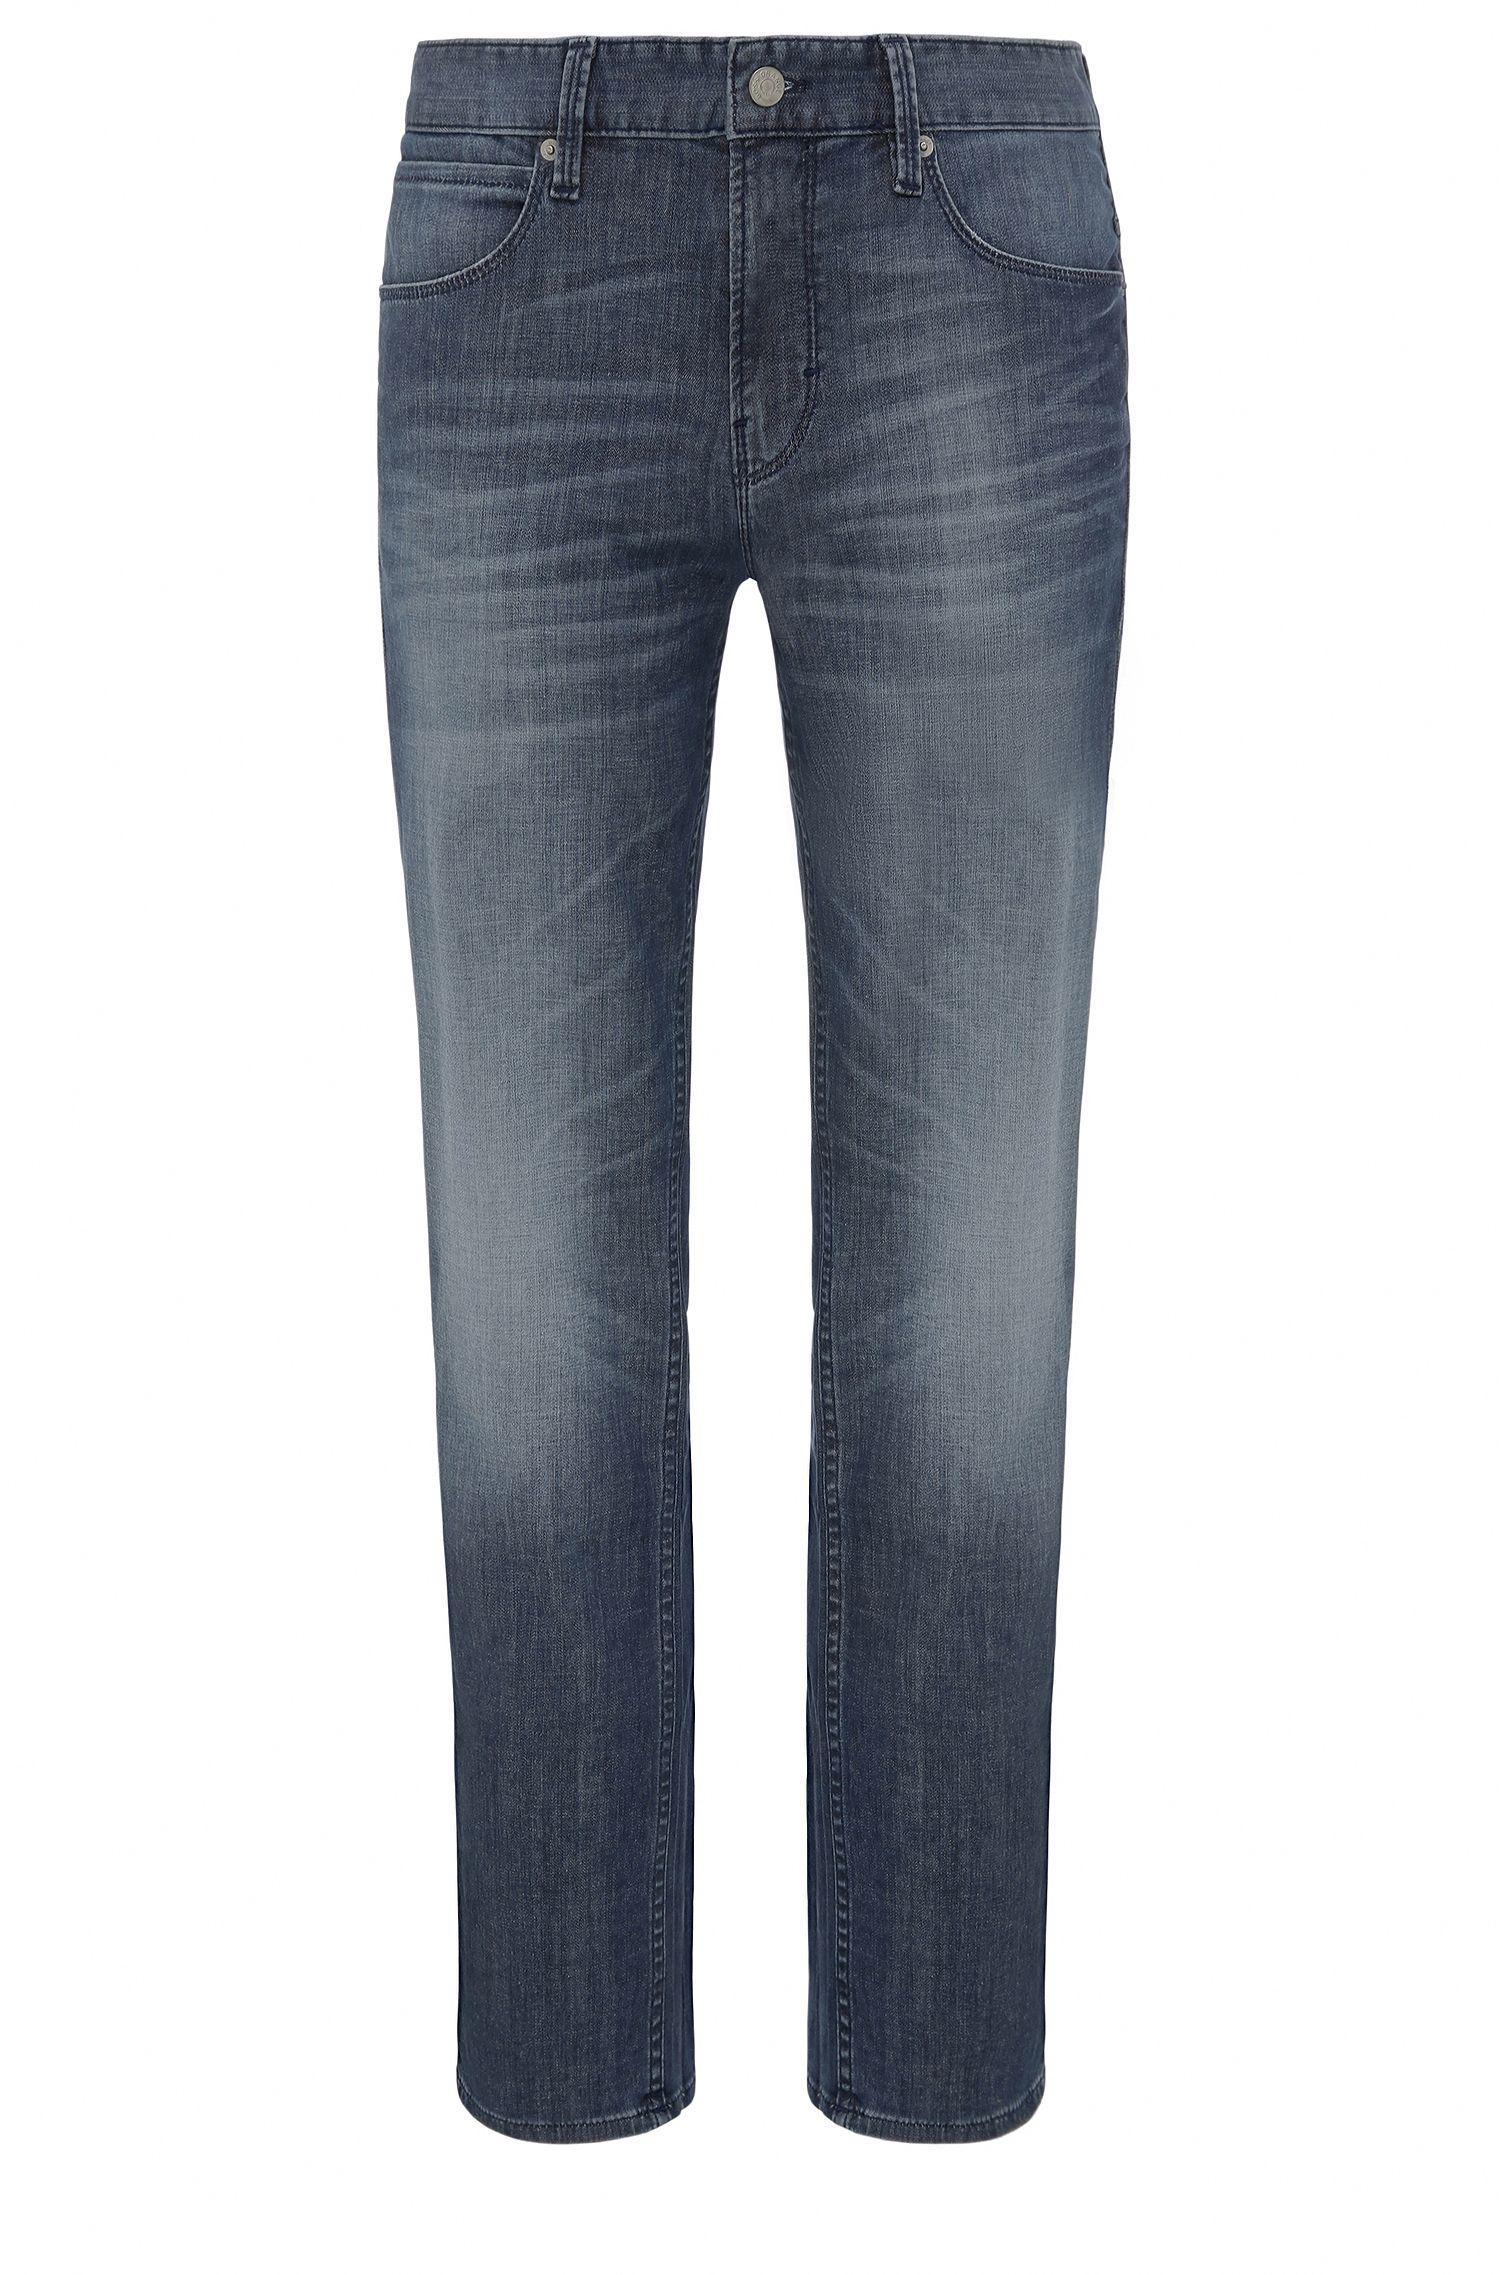 8.25 oz Stretch Cotton Blend Jeans, Slim Fit   Orange63, Blue